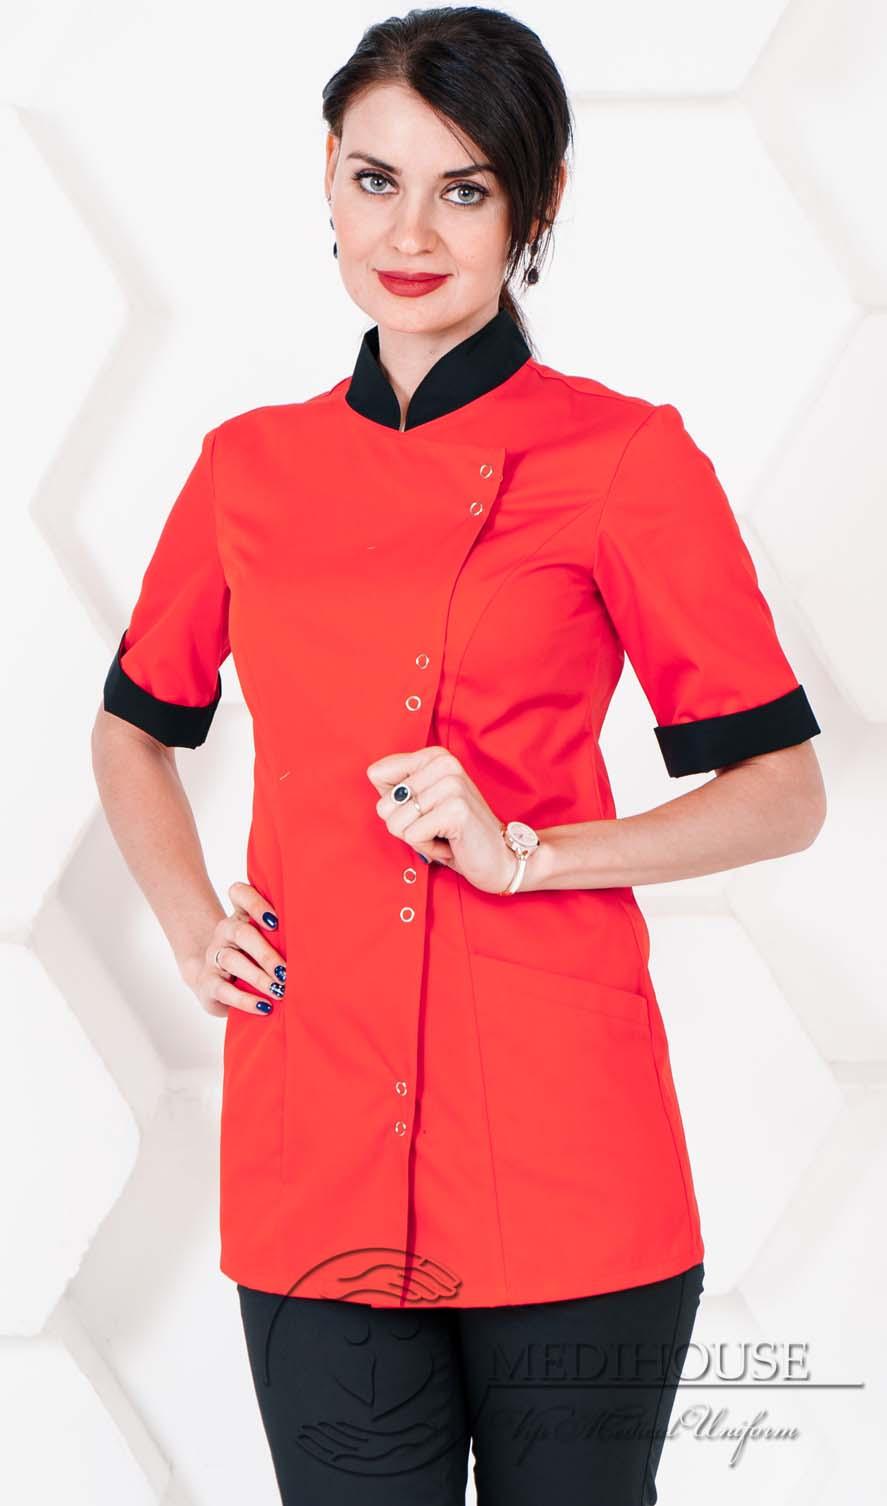 Женский медицинский блузон мод. 4 R&B